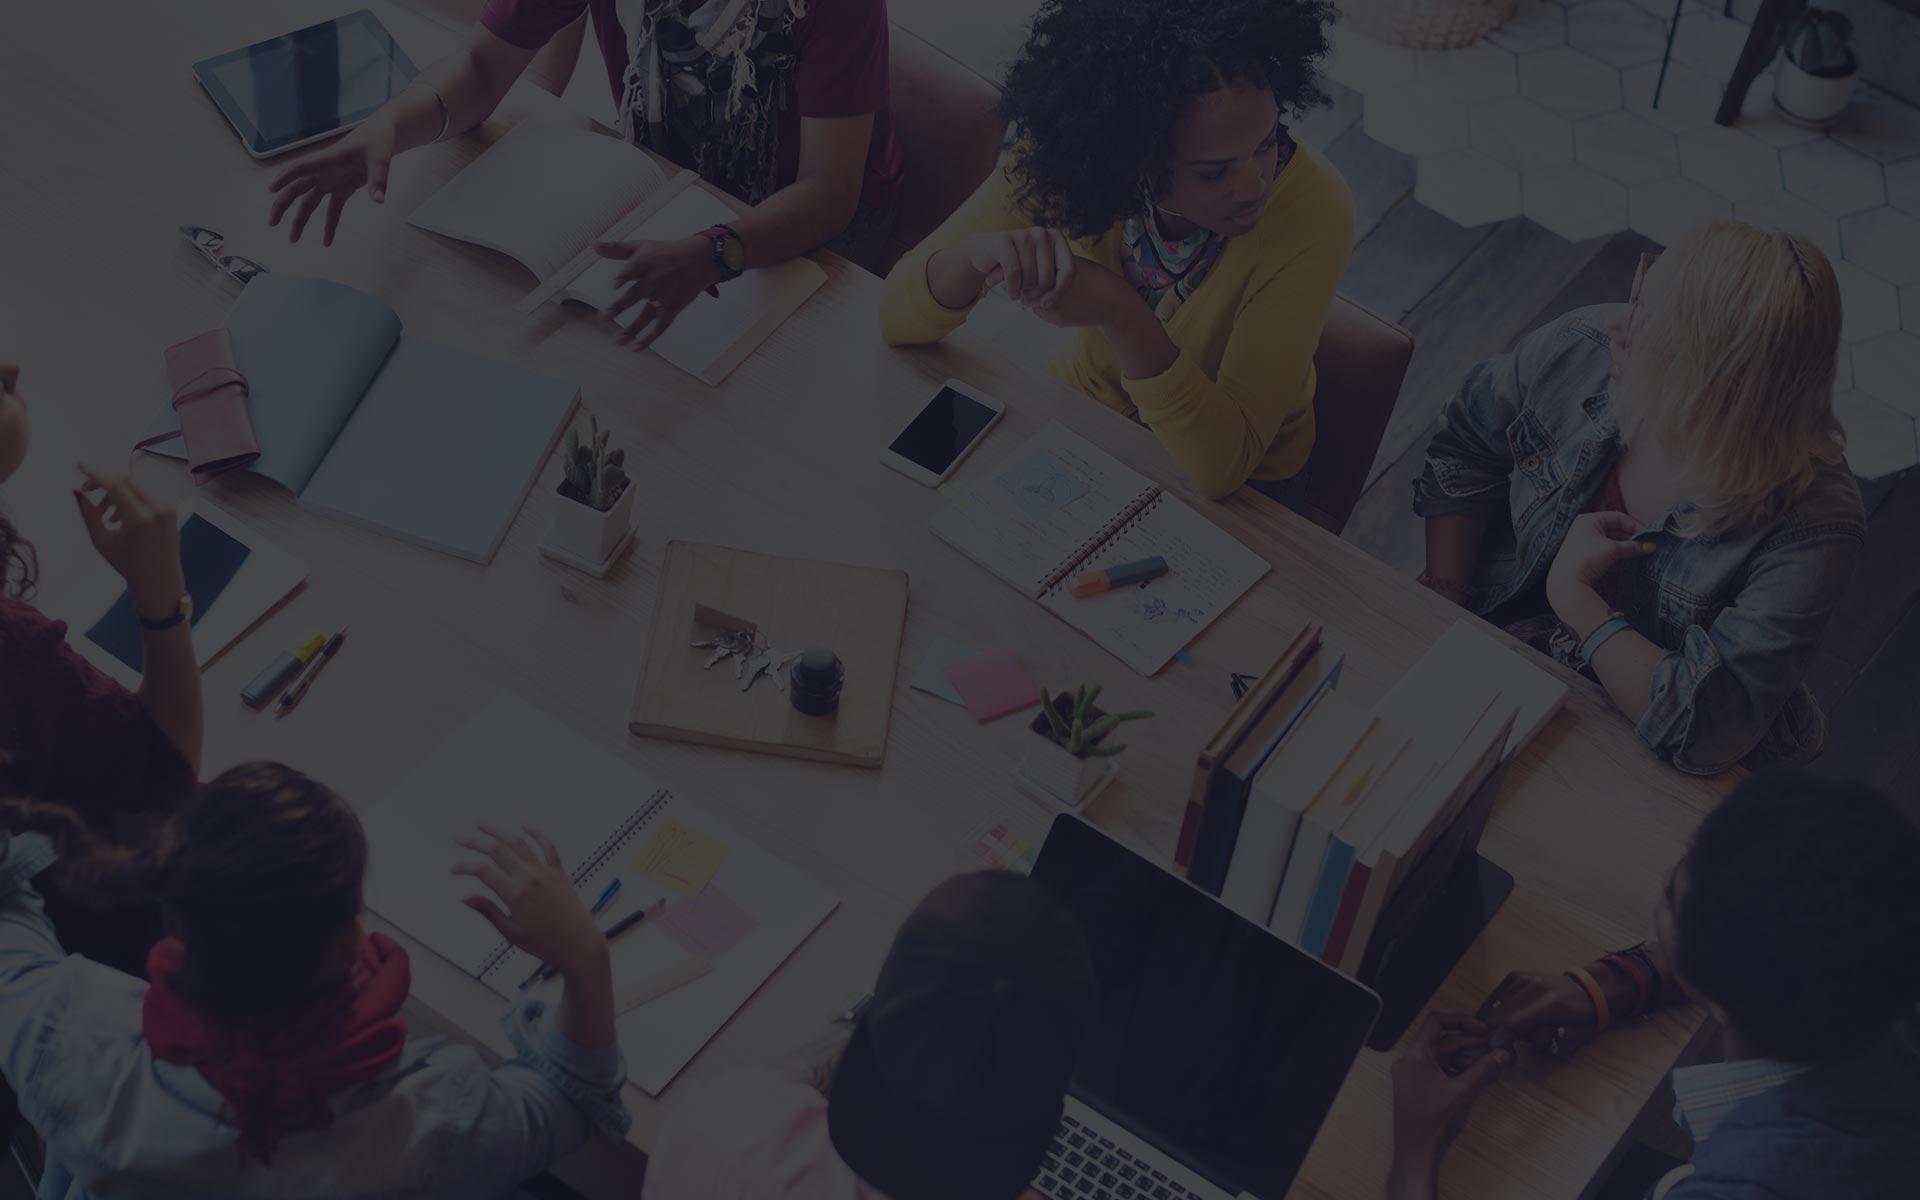 PushPolitics Online Advocacy - Digital Engagement - Teamwork & Cooperation